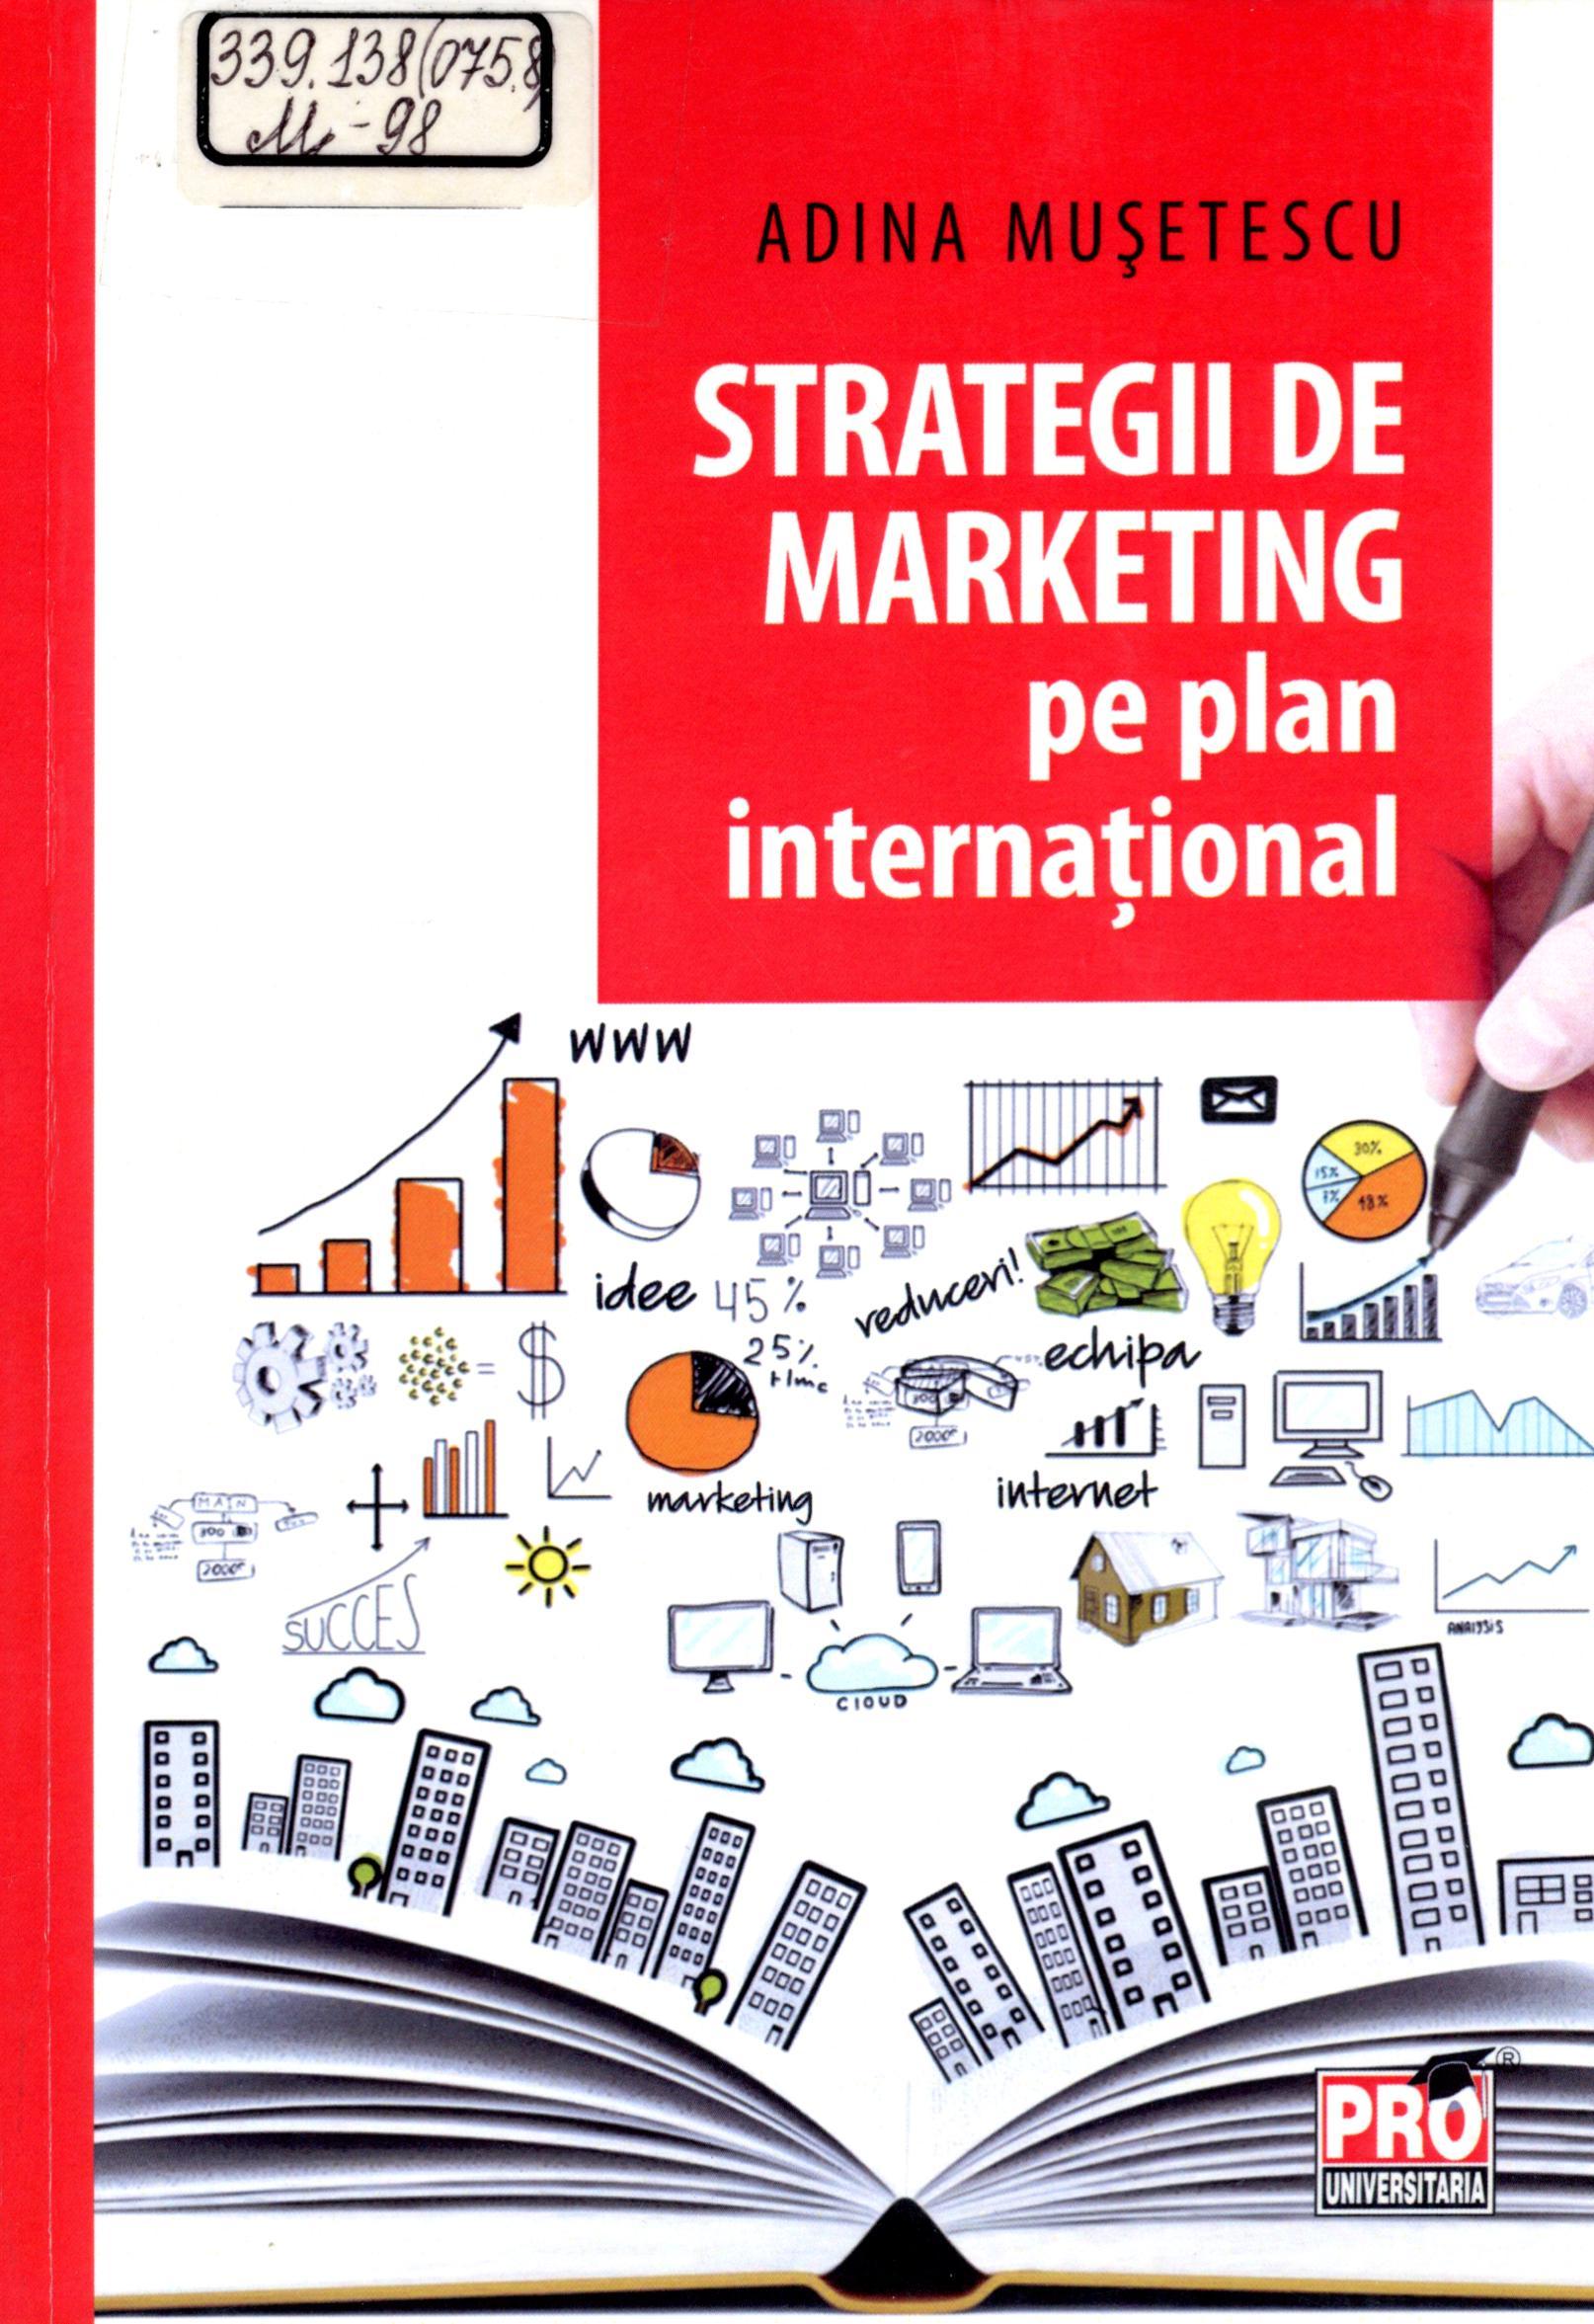 Strategii de marketing pe plan internațional